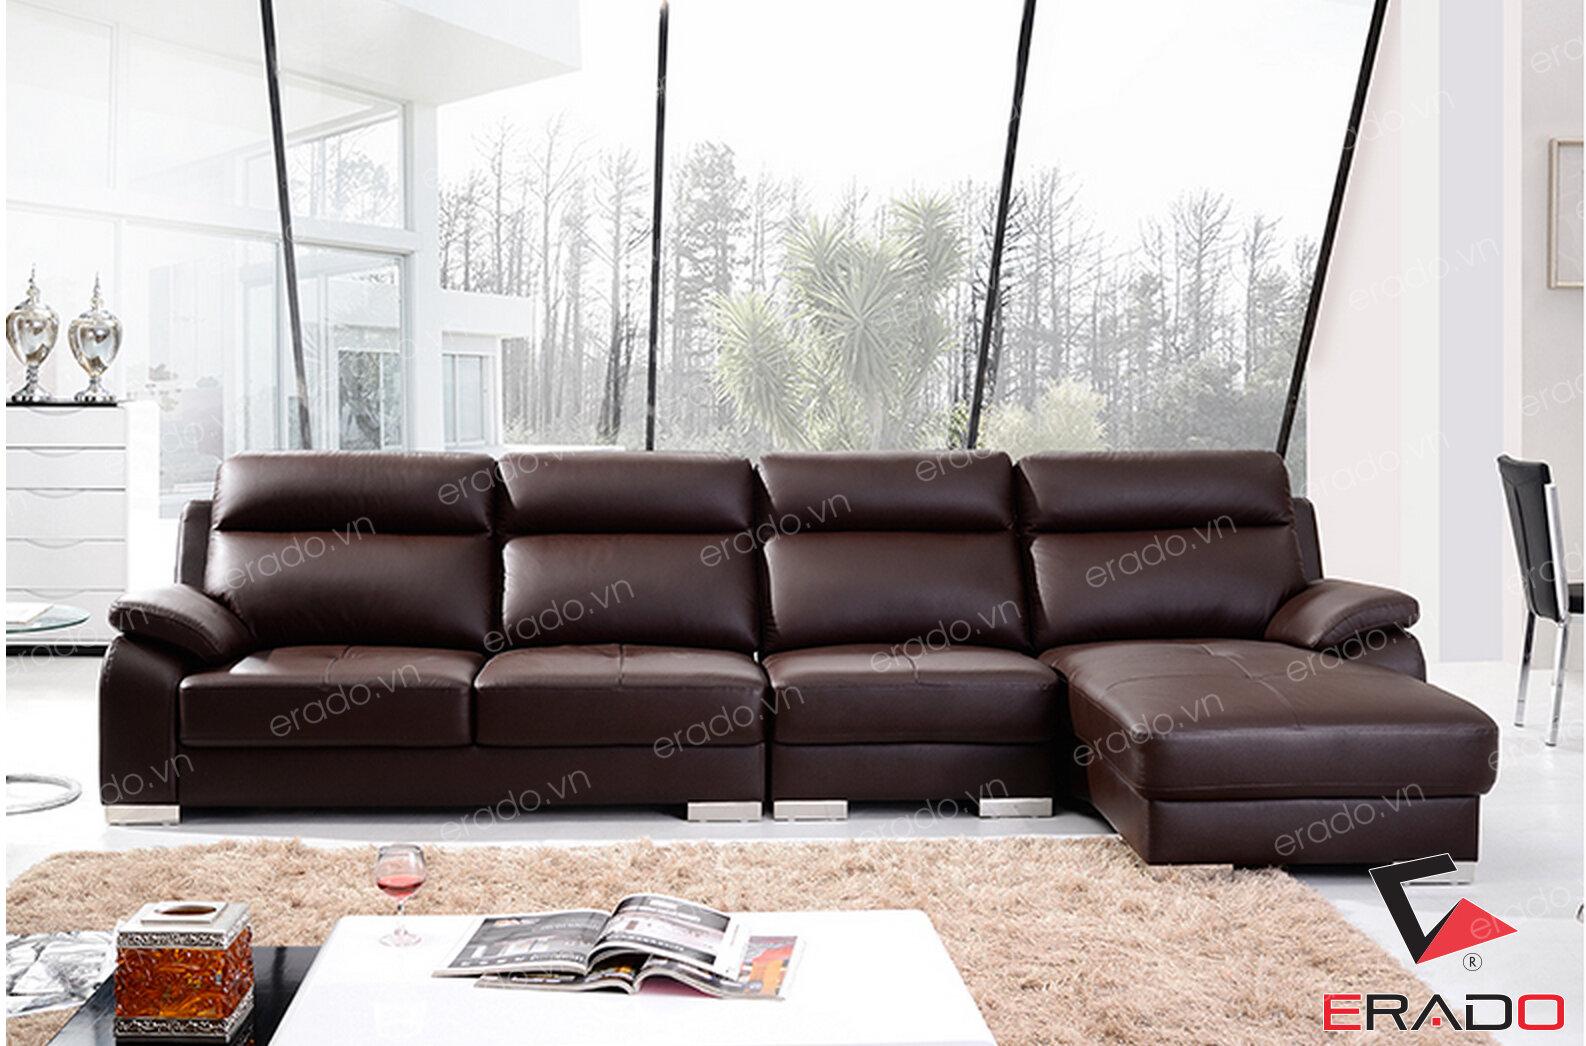 Sofa da mã 377